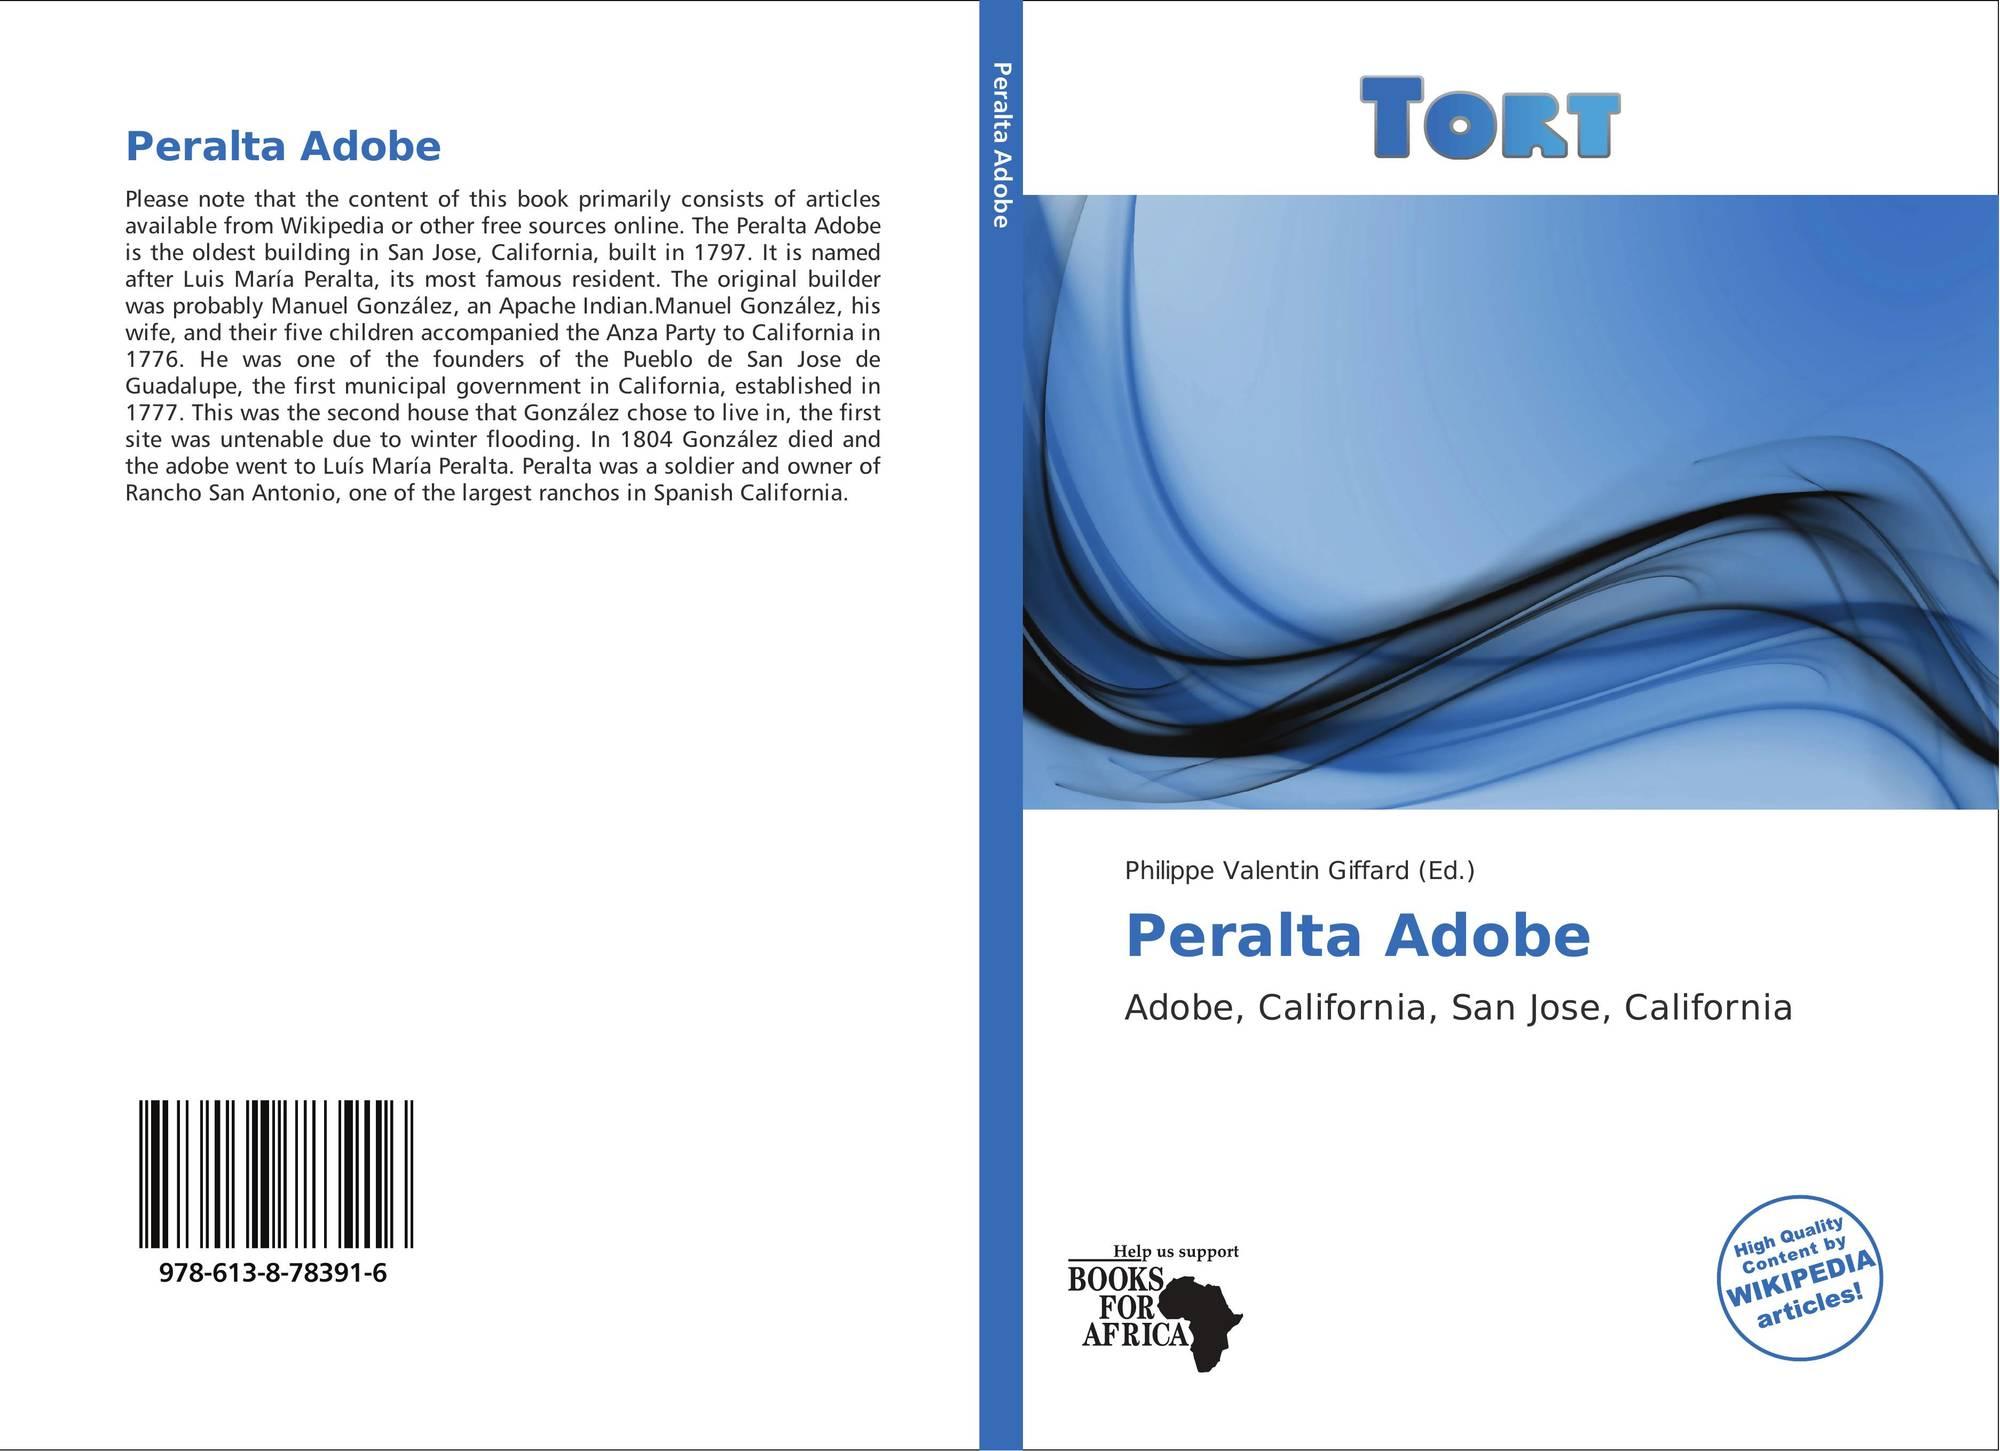 Peralta Adobe 978 613 8 78391 6 6138783913 9786138783916